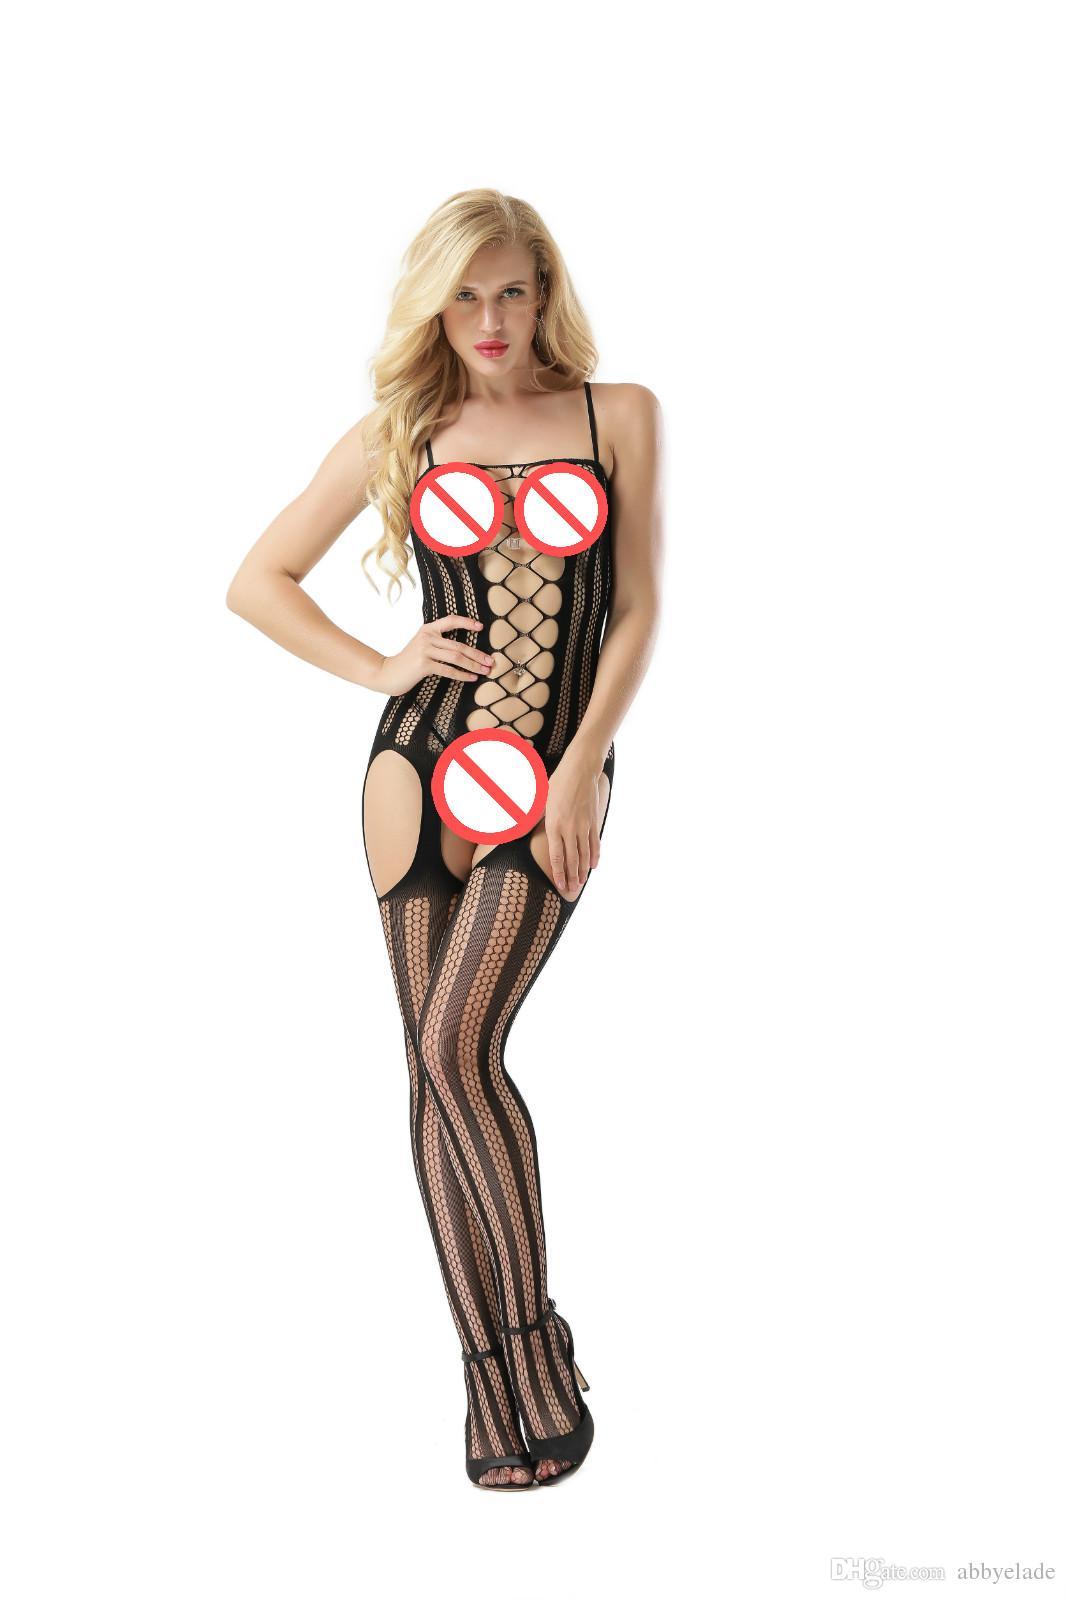 Sem mangas Arrastão Chemise Liga Corpo Lotação Nightwear corpo meia stripper delicado Sexi Lingerie Opaca Bodysocks bodystocking sexy